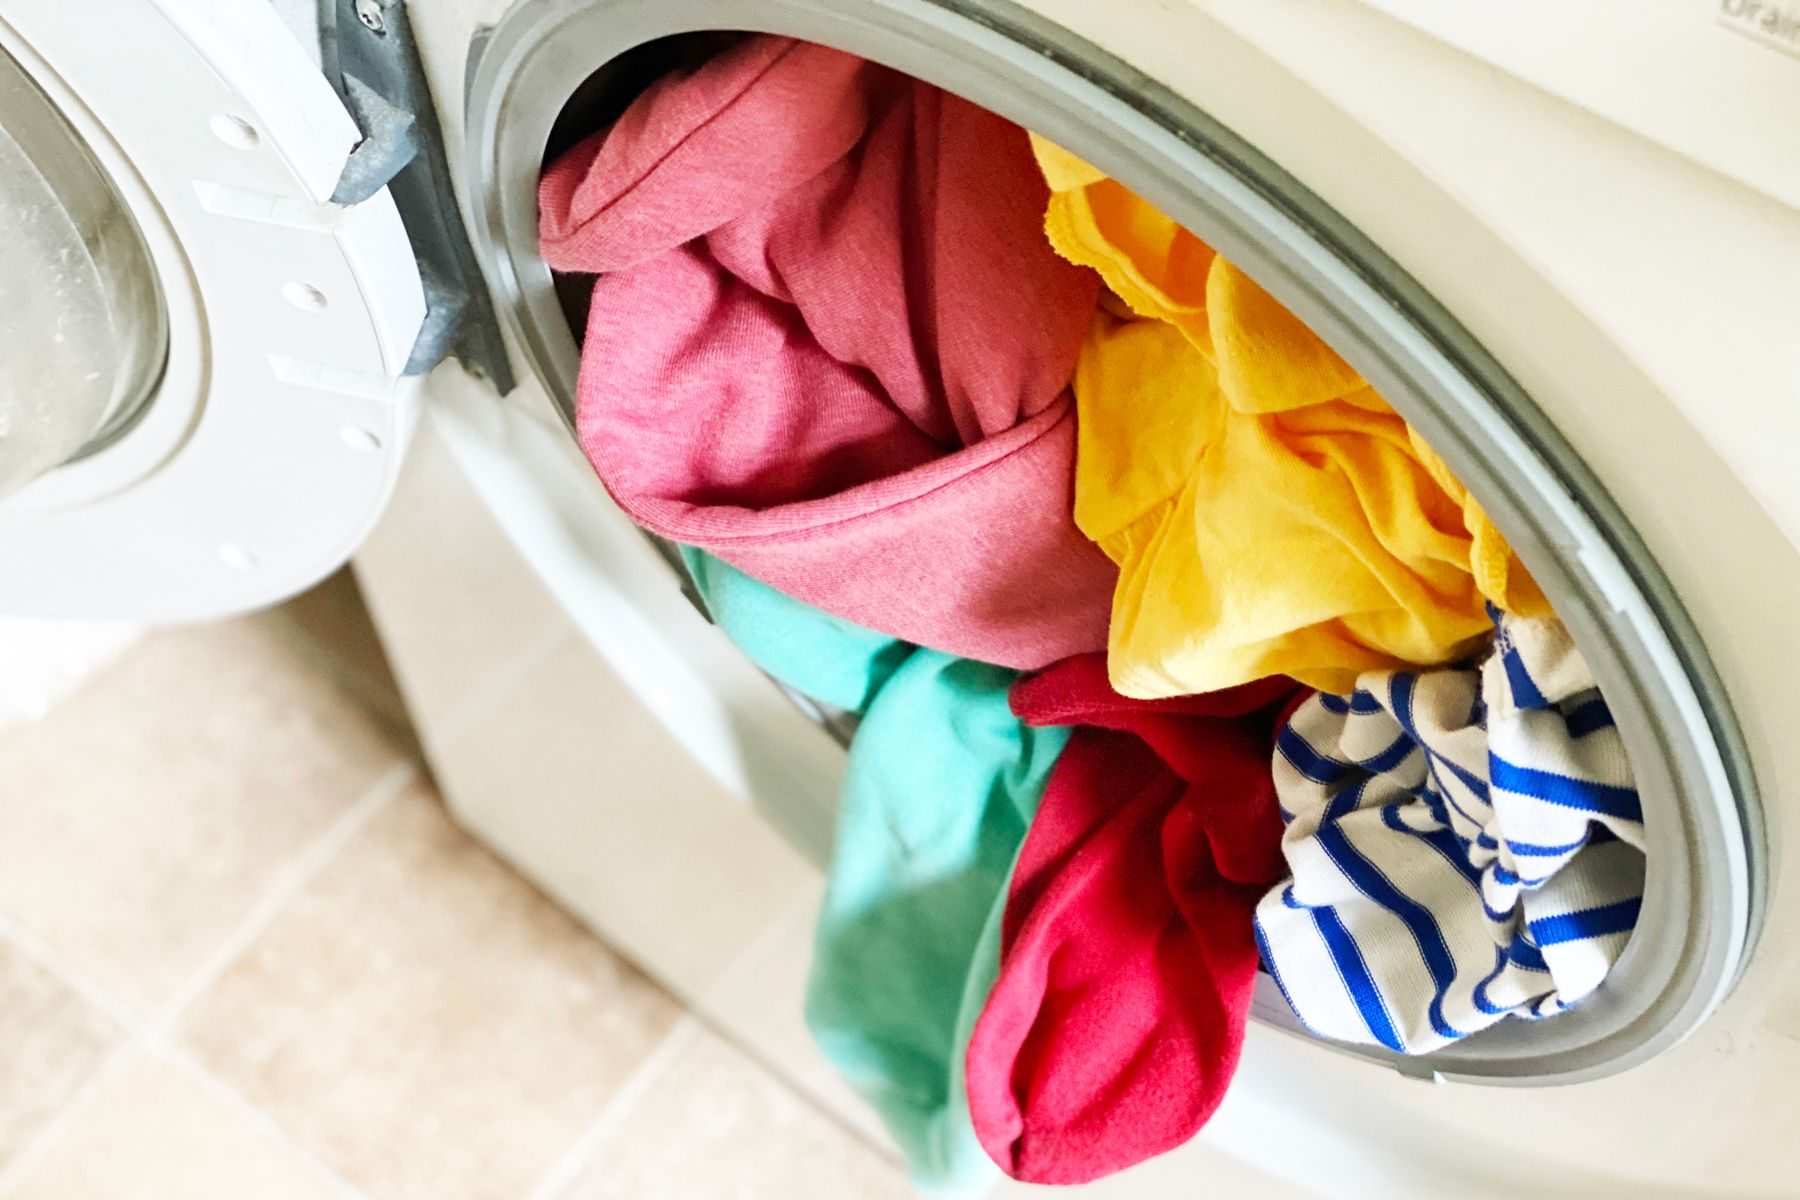 An overly full washing machine